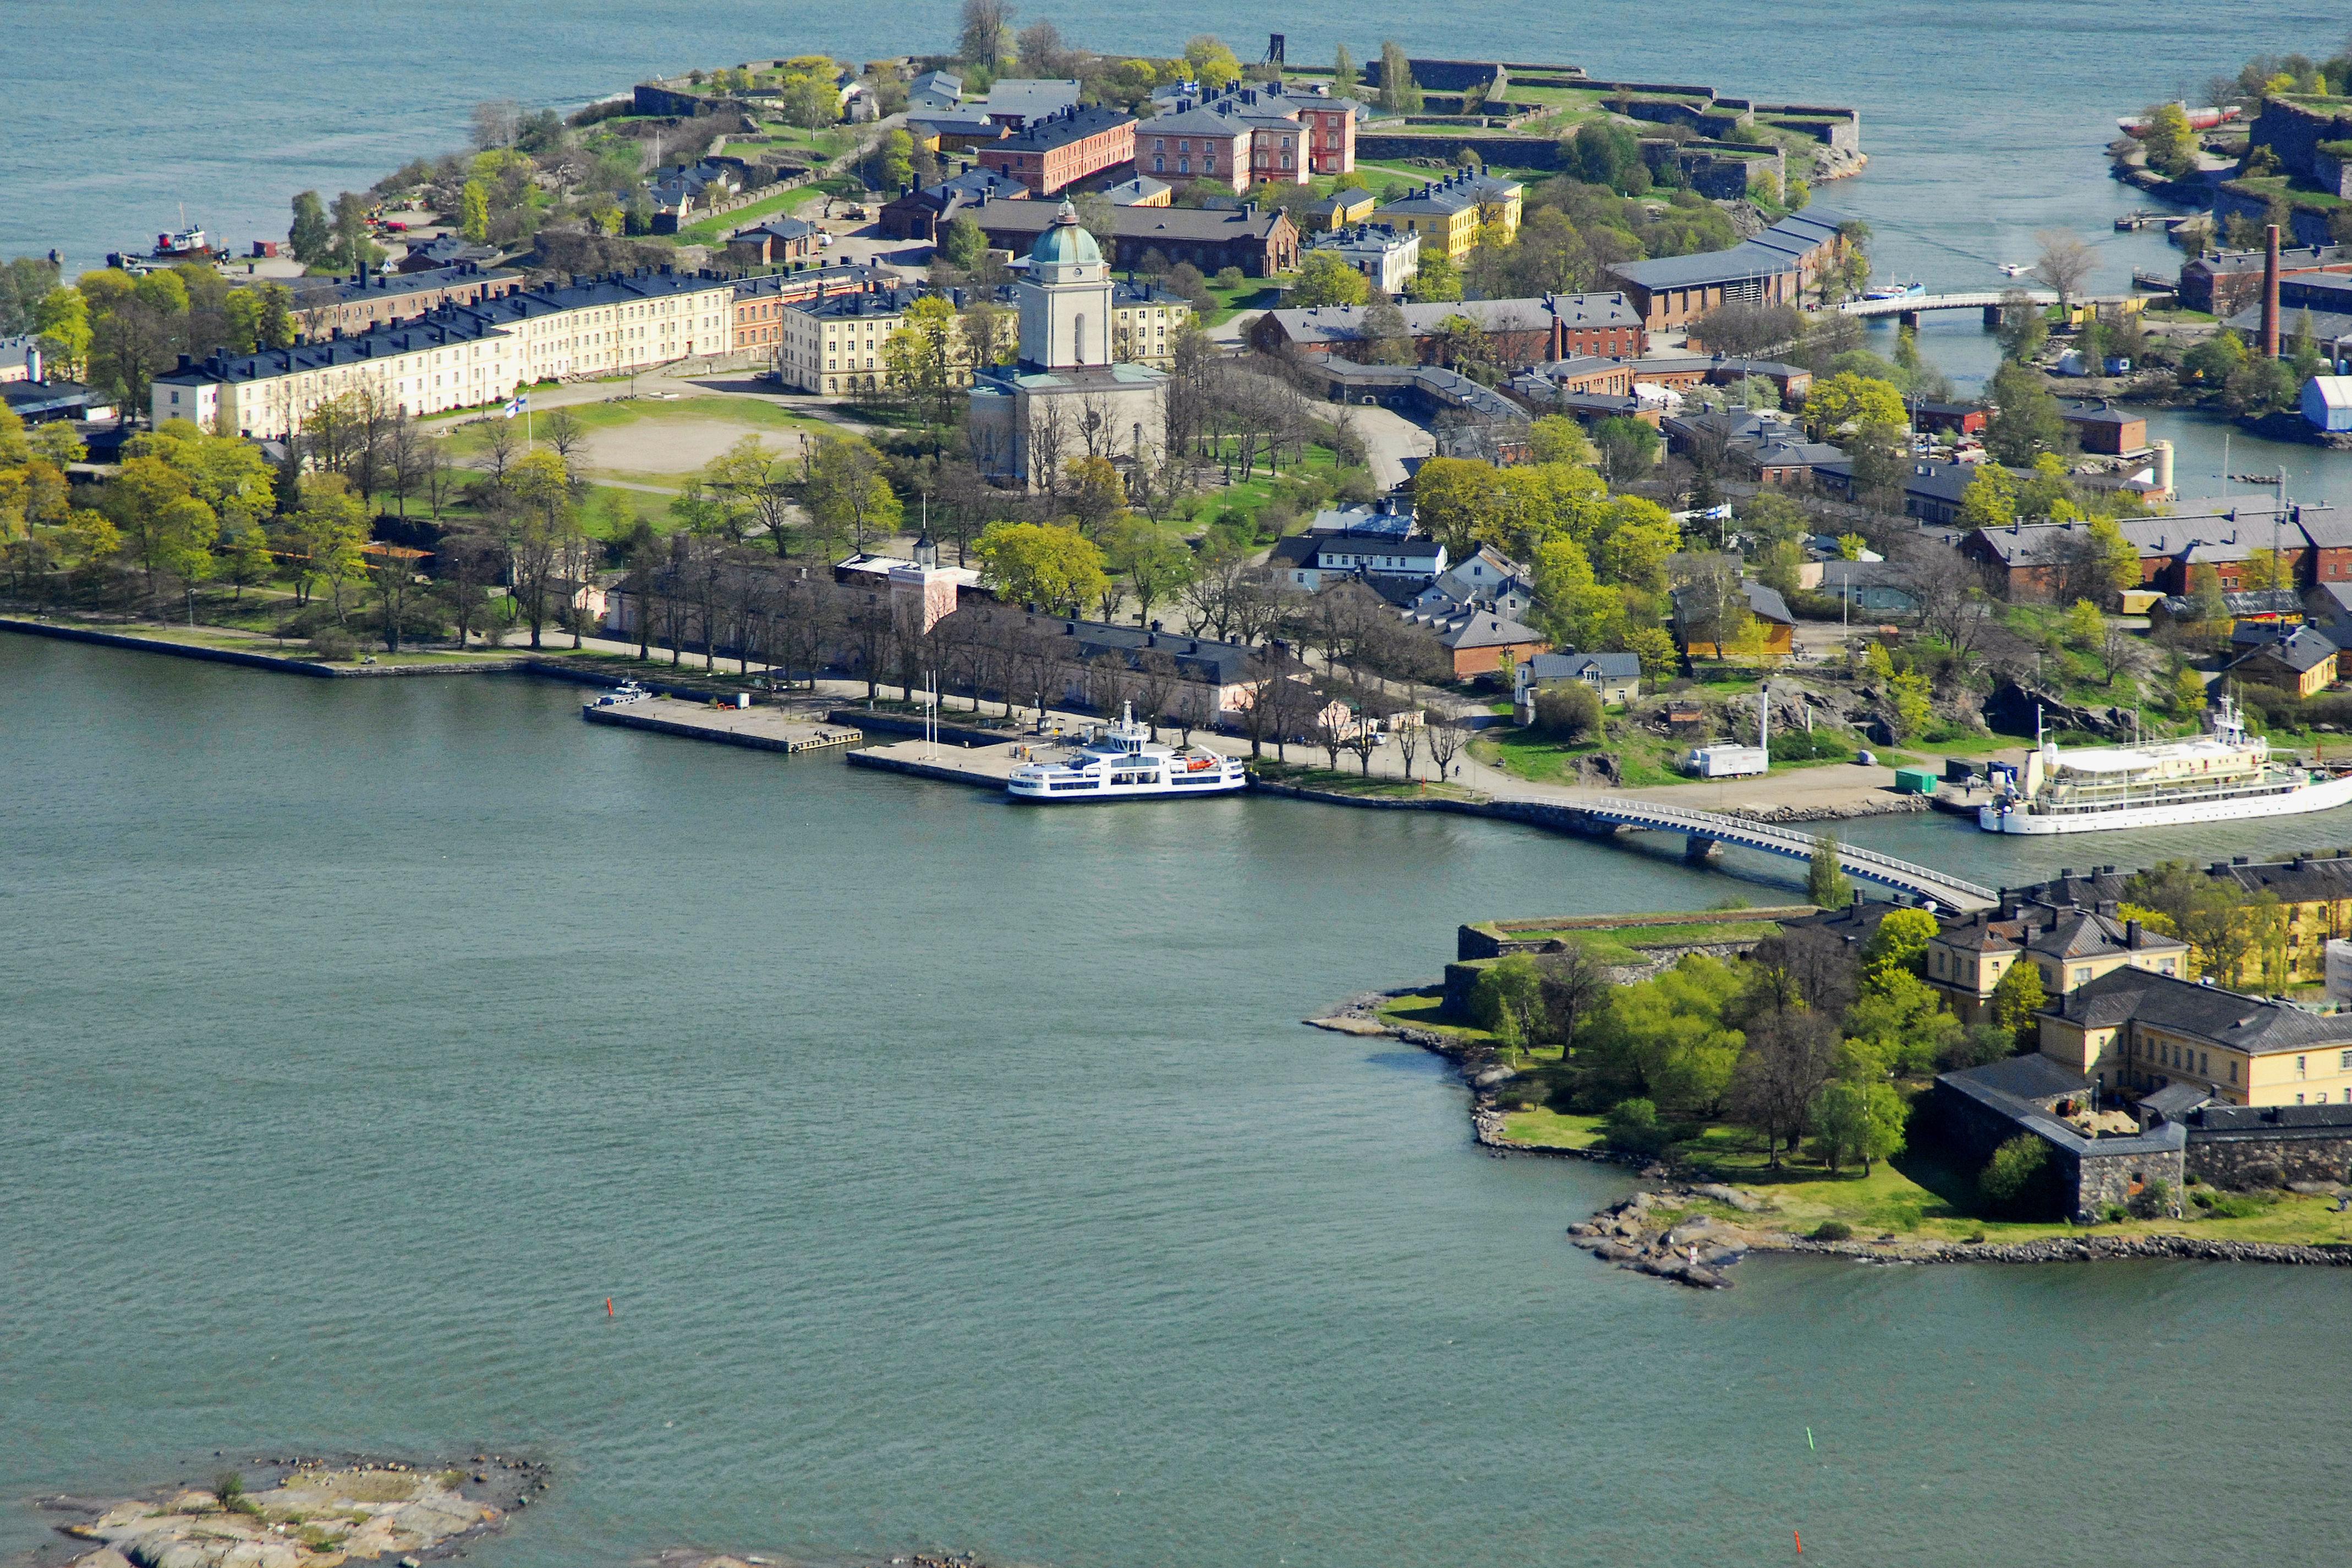 Ferry Suomenlinna